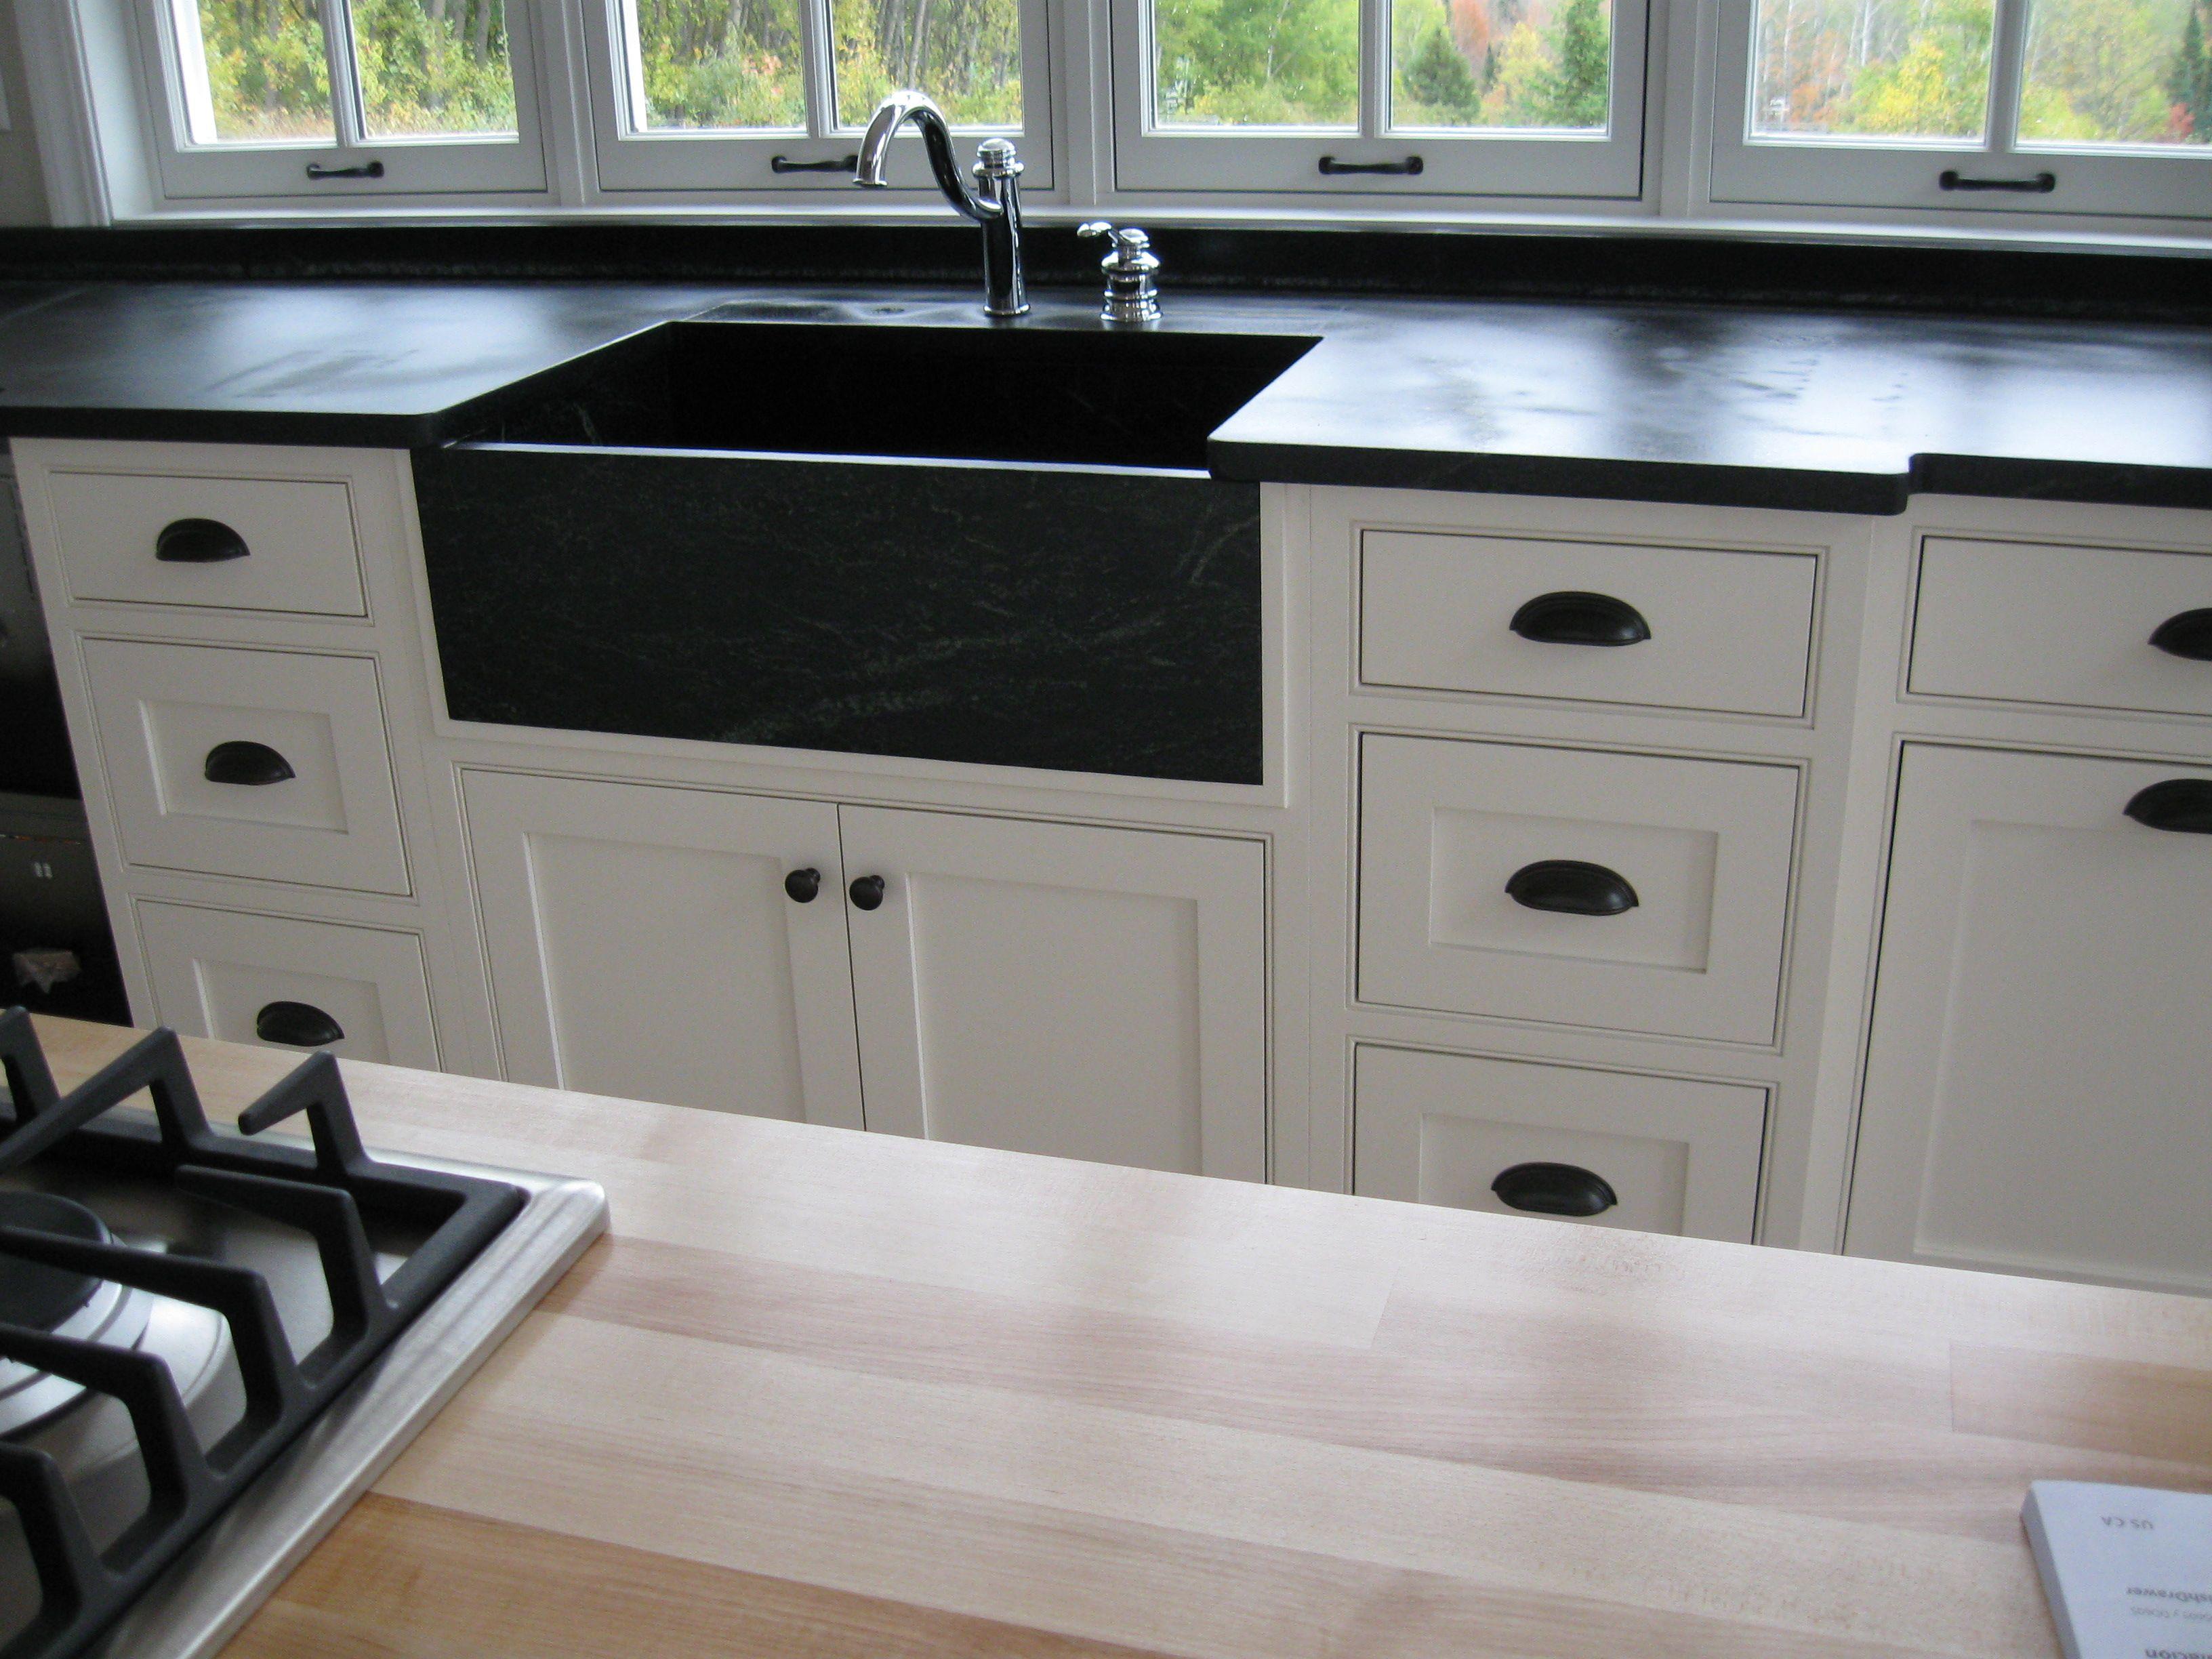 White farmhouse sink, oil rubbed bronze hardware